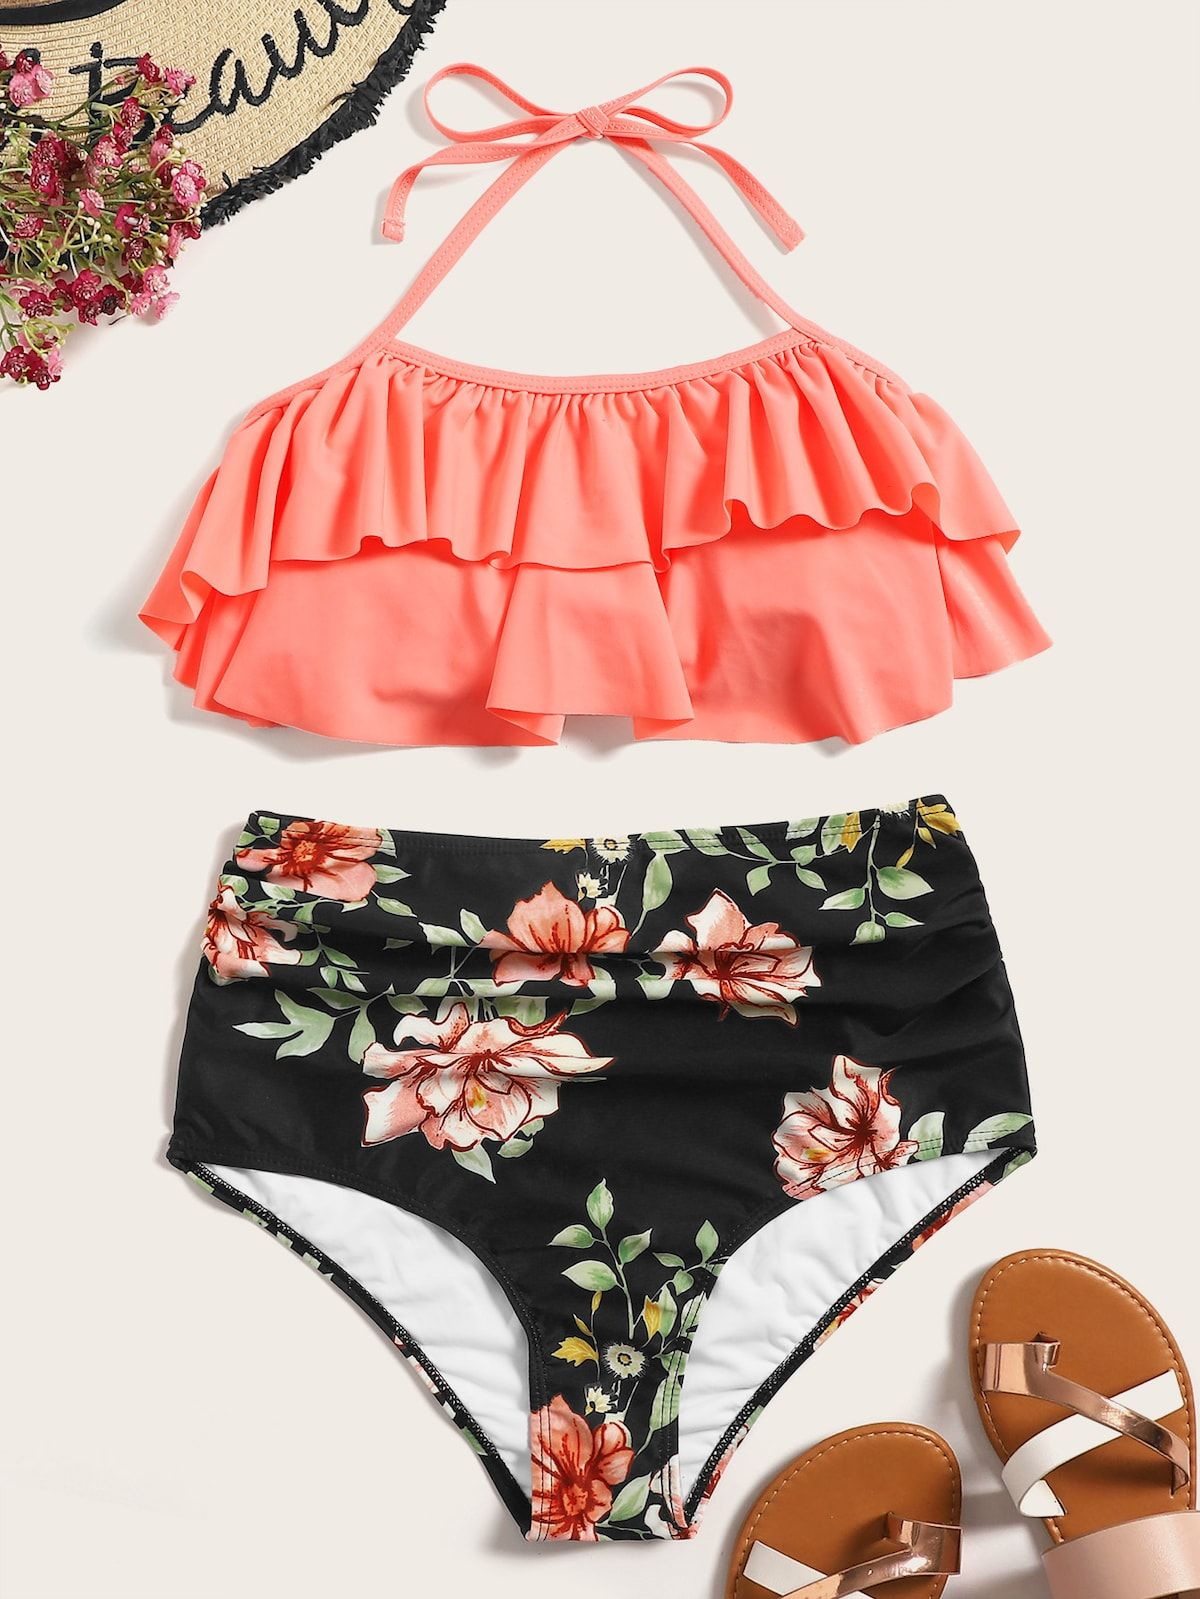 eb8158223b370 Layered Ruffle Halter Top With Random Floral Ruched Bikini in 2019 ...